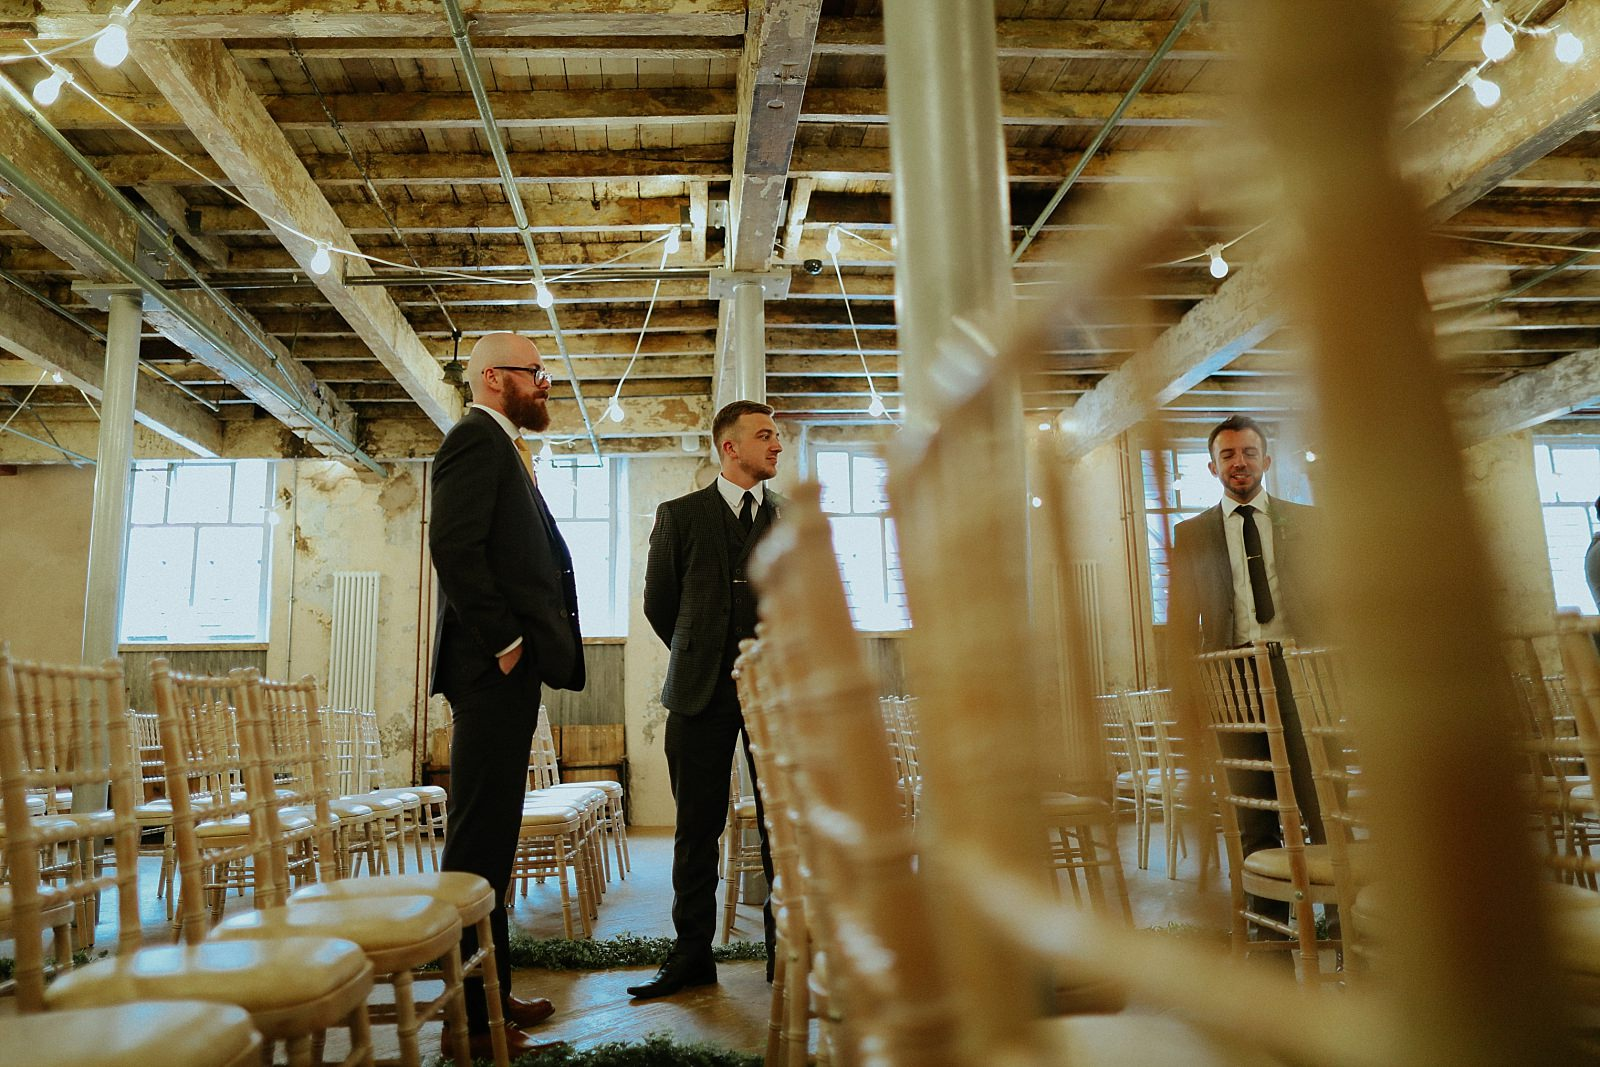 creative shot of groom in ceremony room